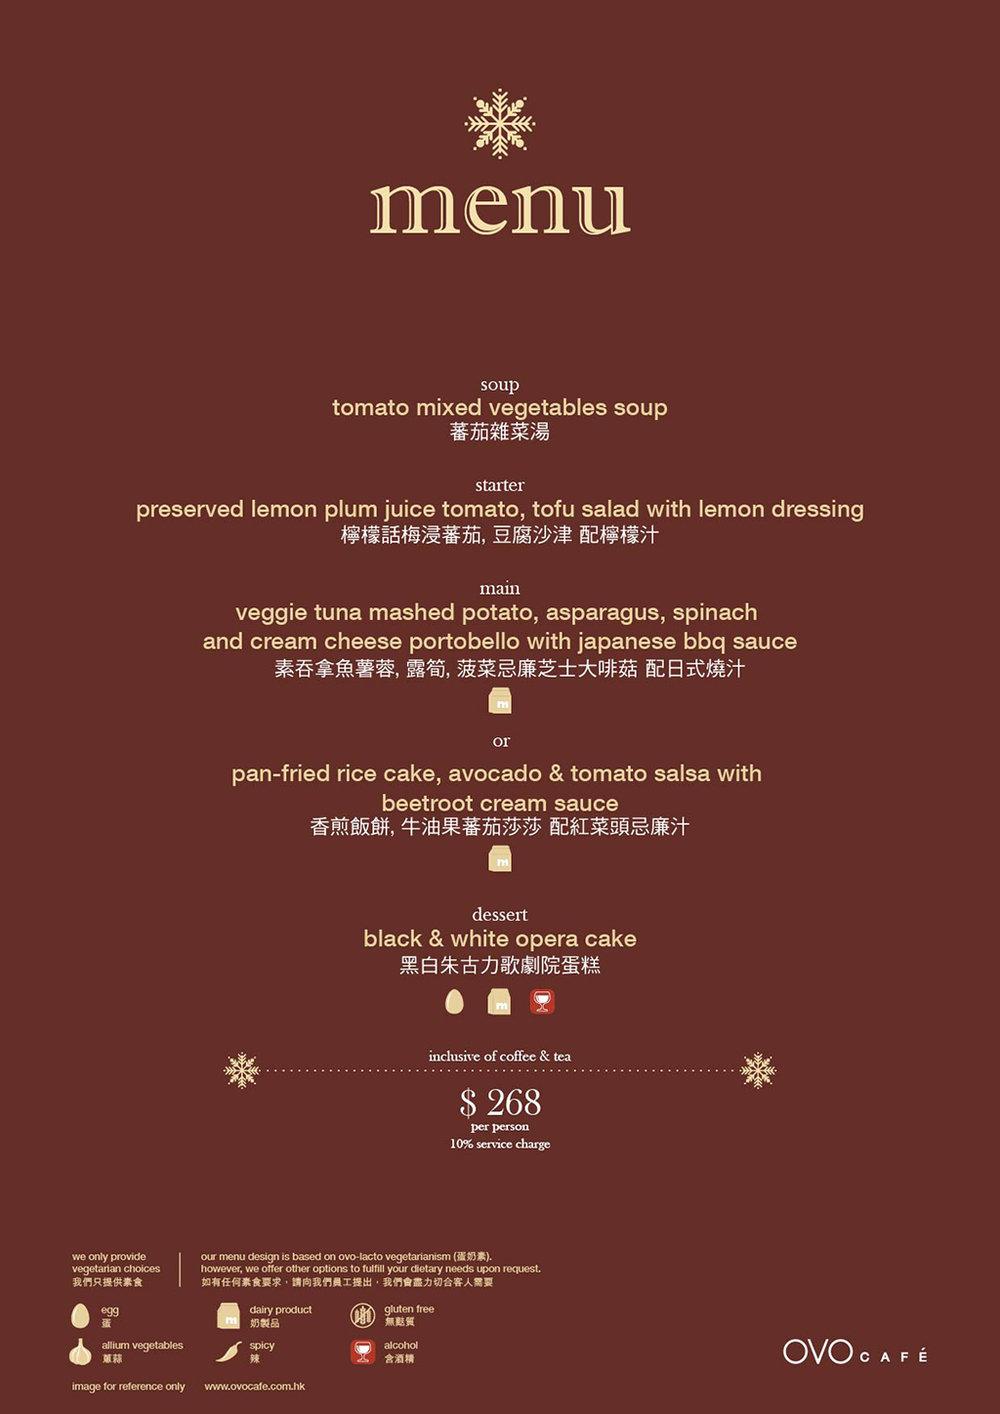 OVOCAFE wanchai menu